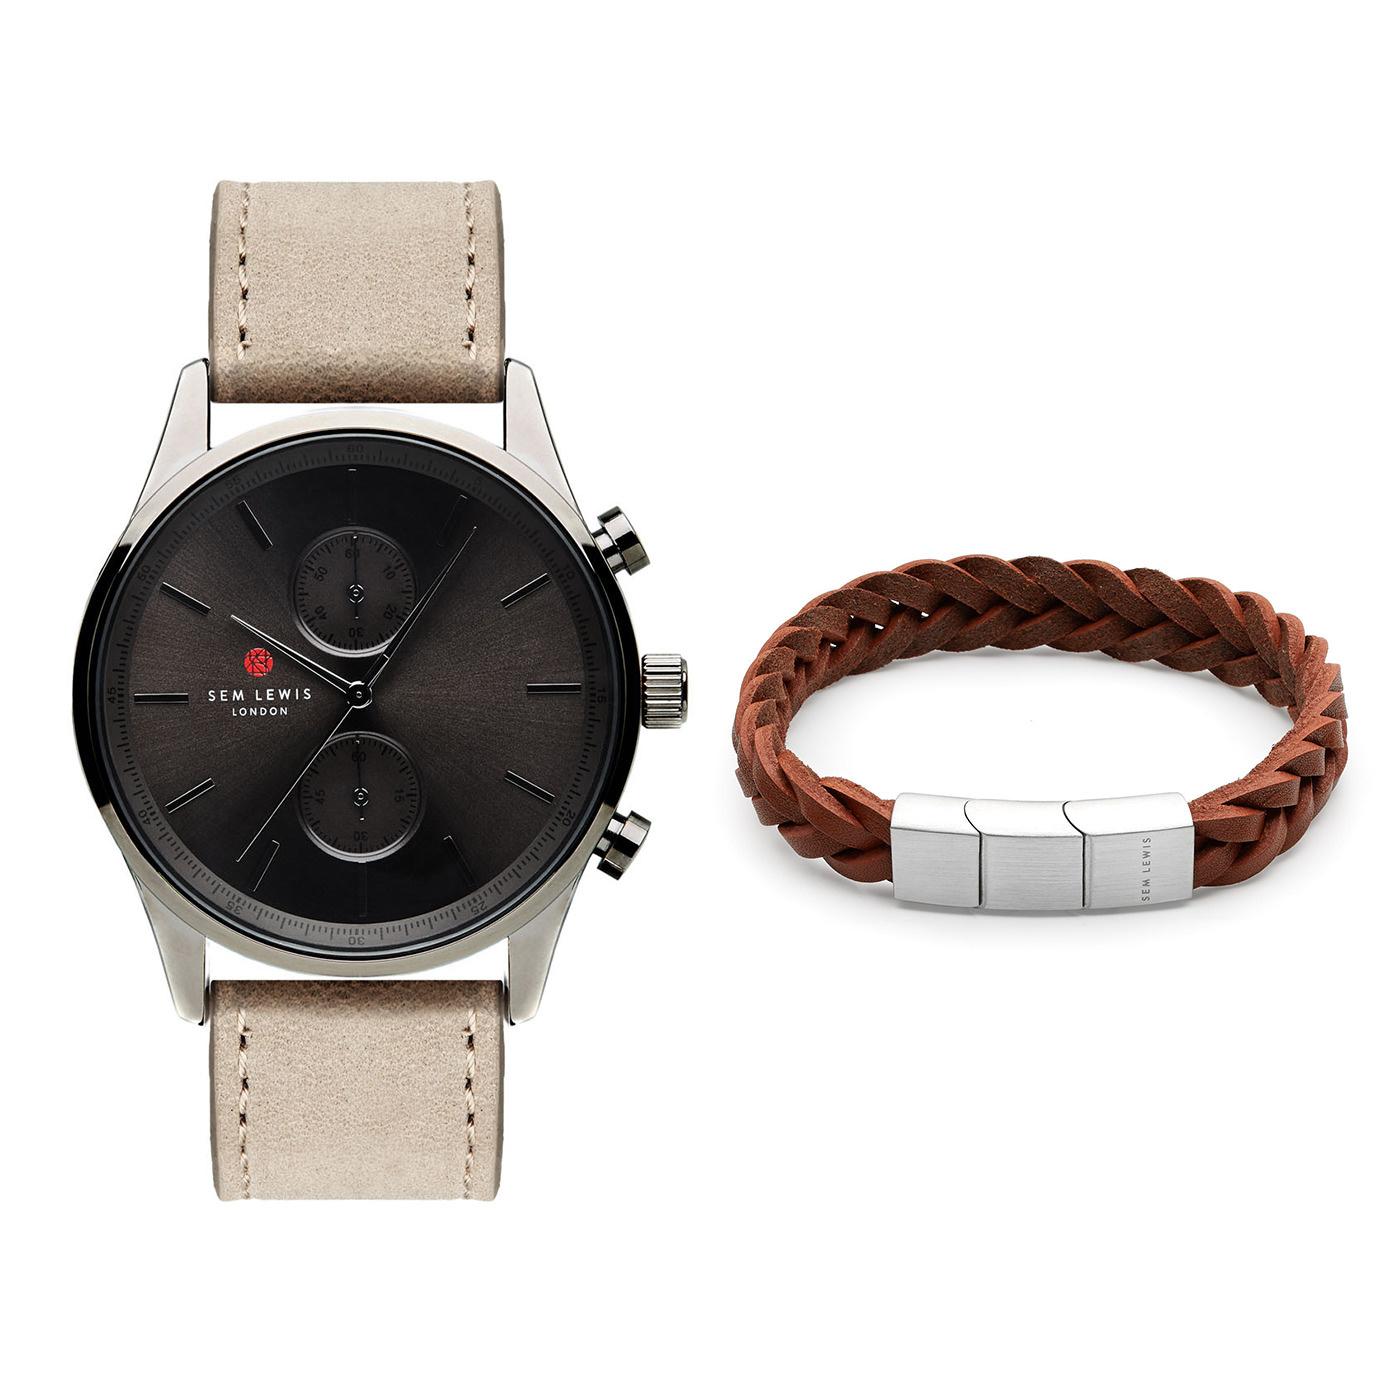 Sem Lewis Metropolitan chrono watch and Bakerloo Paddington bracelet giftset